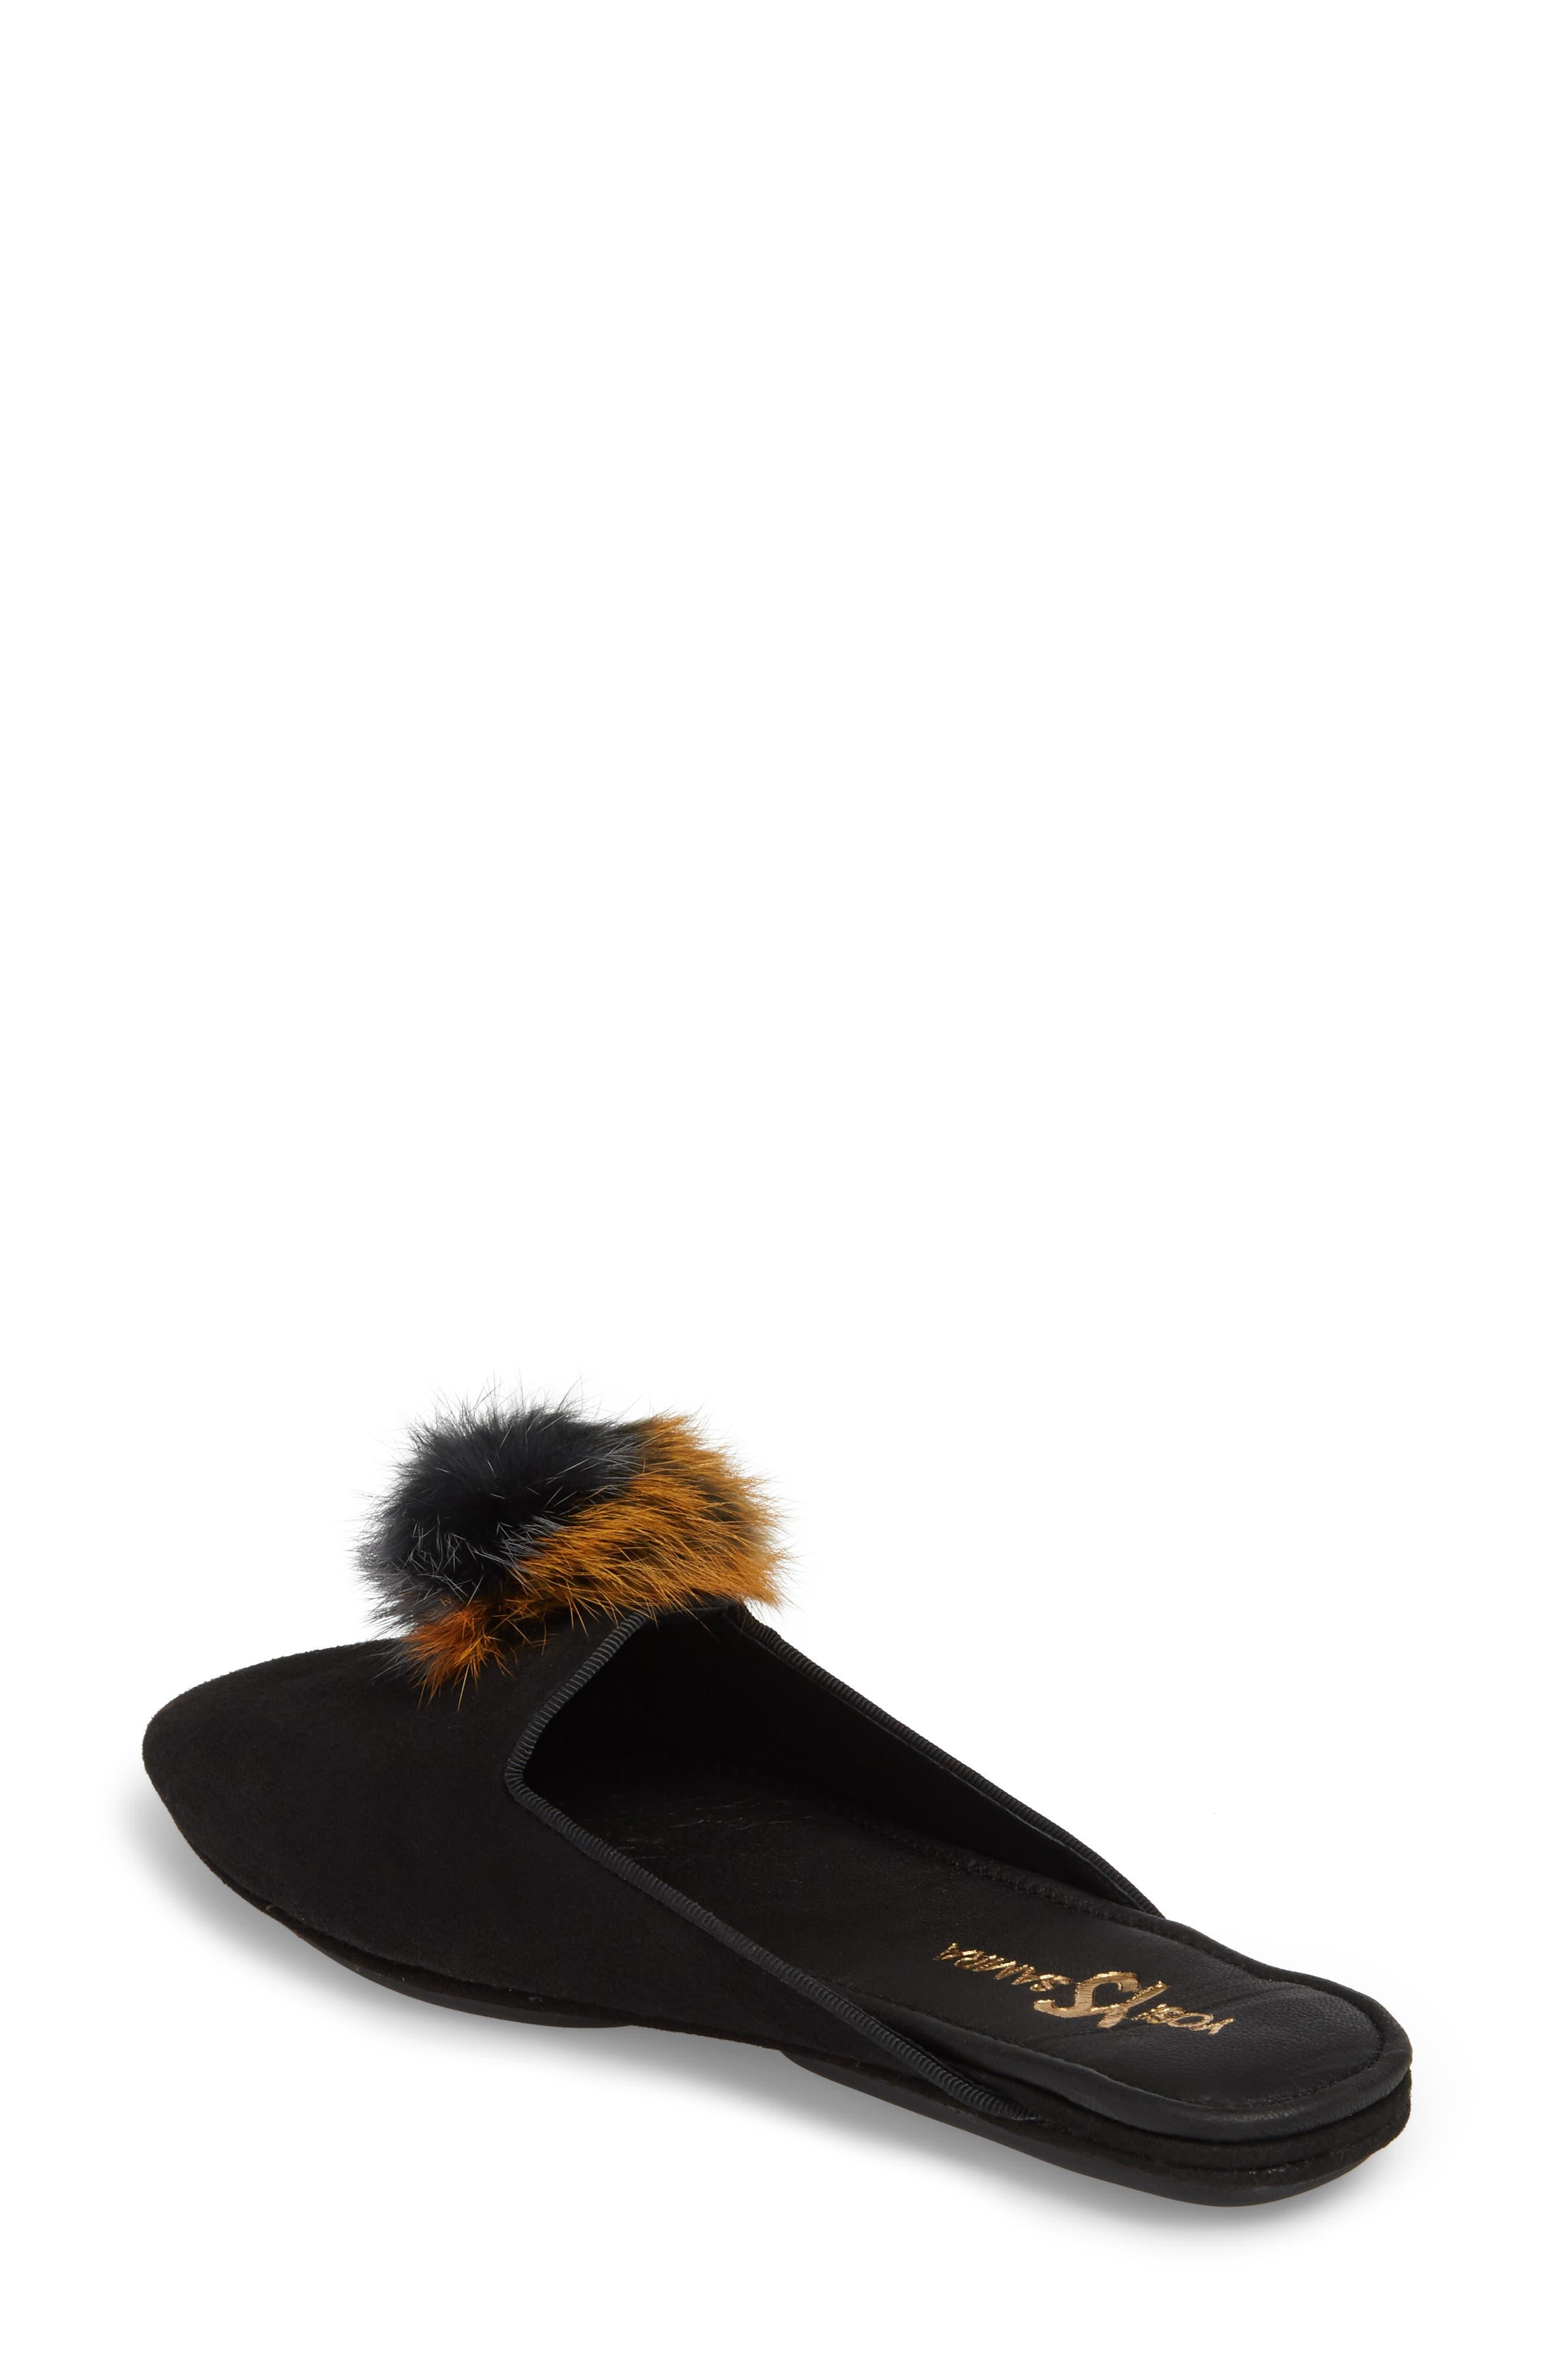 Vidi Genuine Rabbit Fur Loafer Mule,                             Alternate thumbnail 2, color,                             BLACK RABBIT FUR